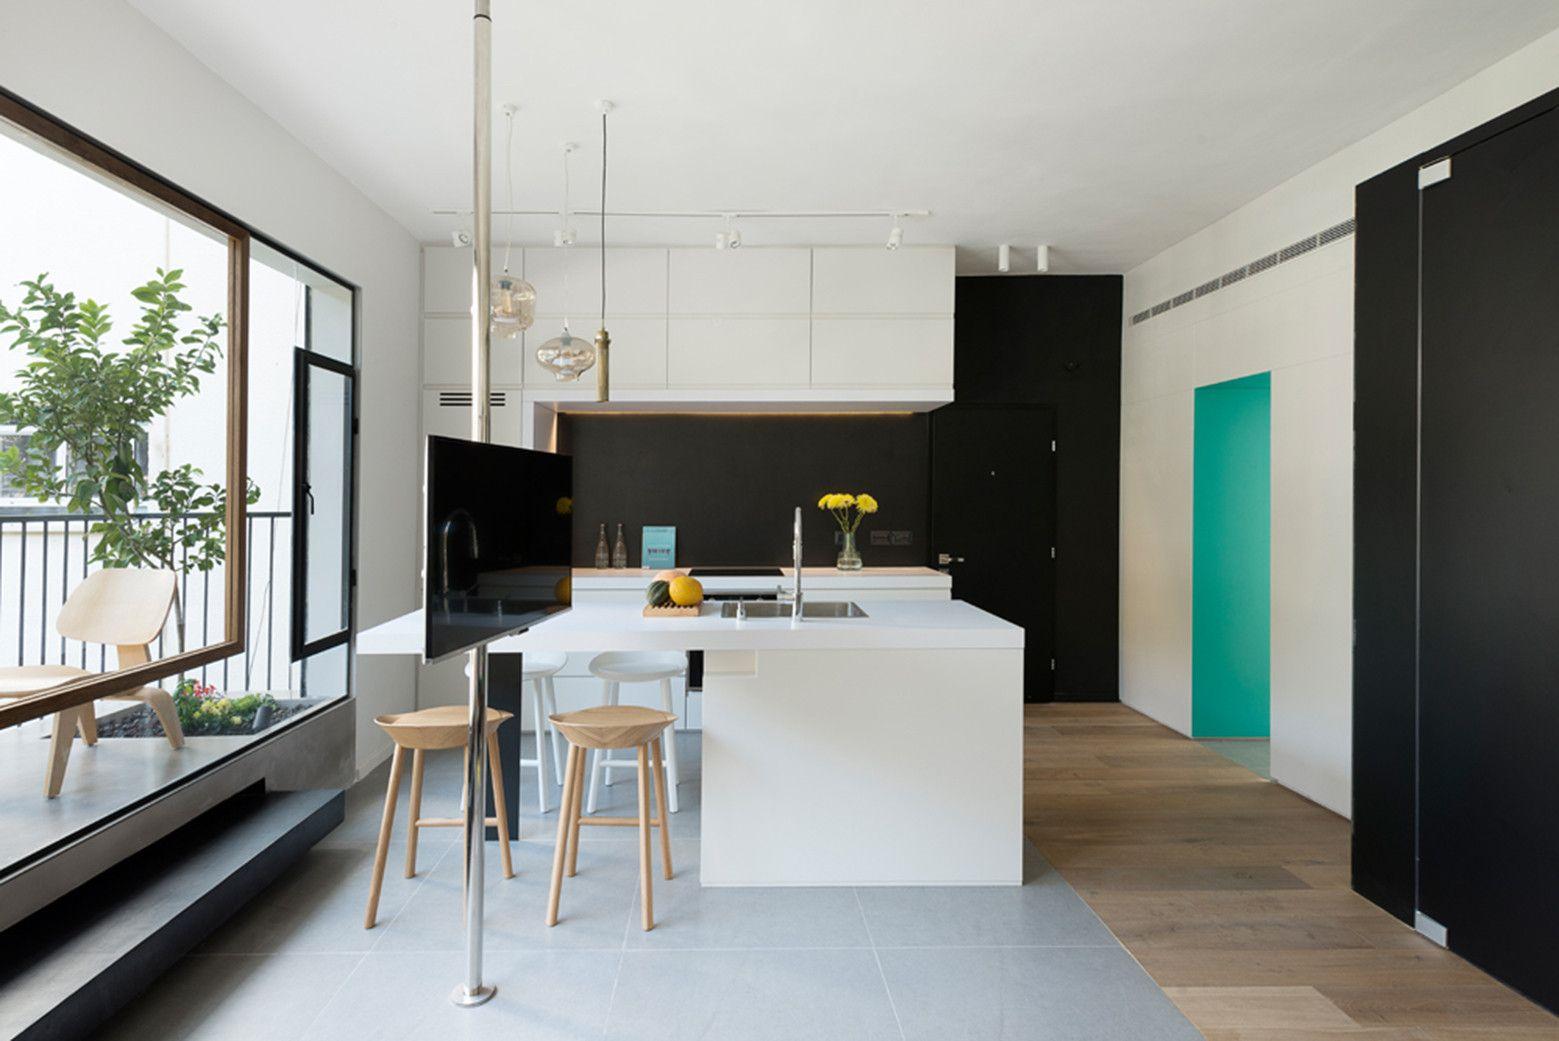 Apartment in Tel Aviv / Amir Navon-Studio 6B, Maayan Zusman Interior ...